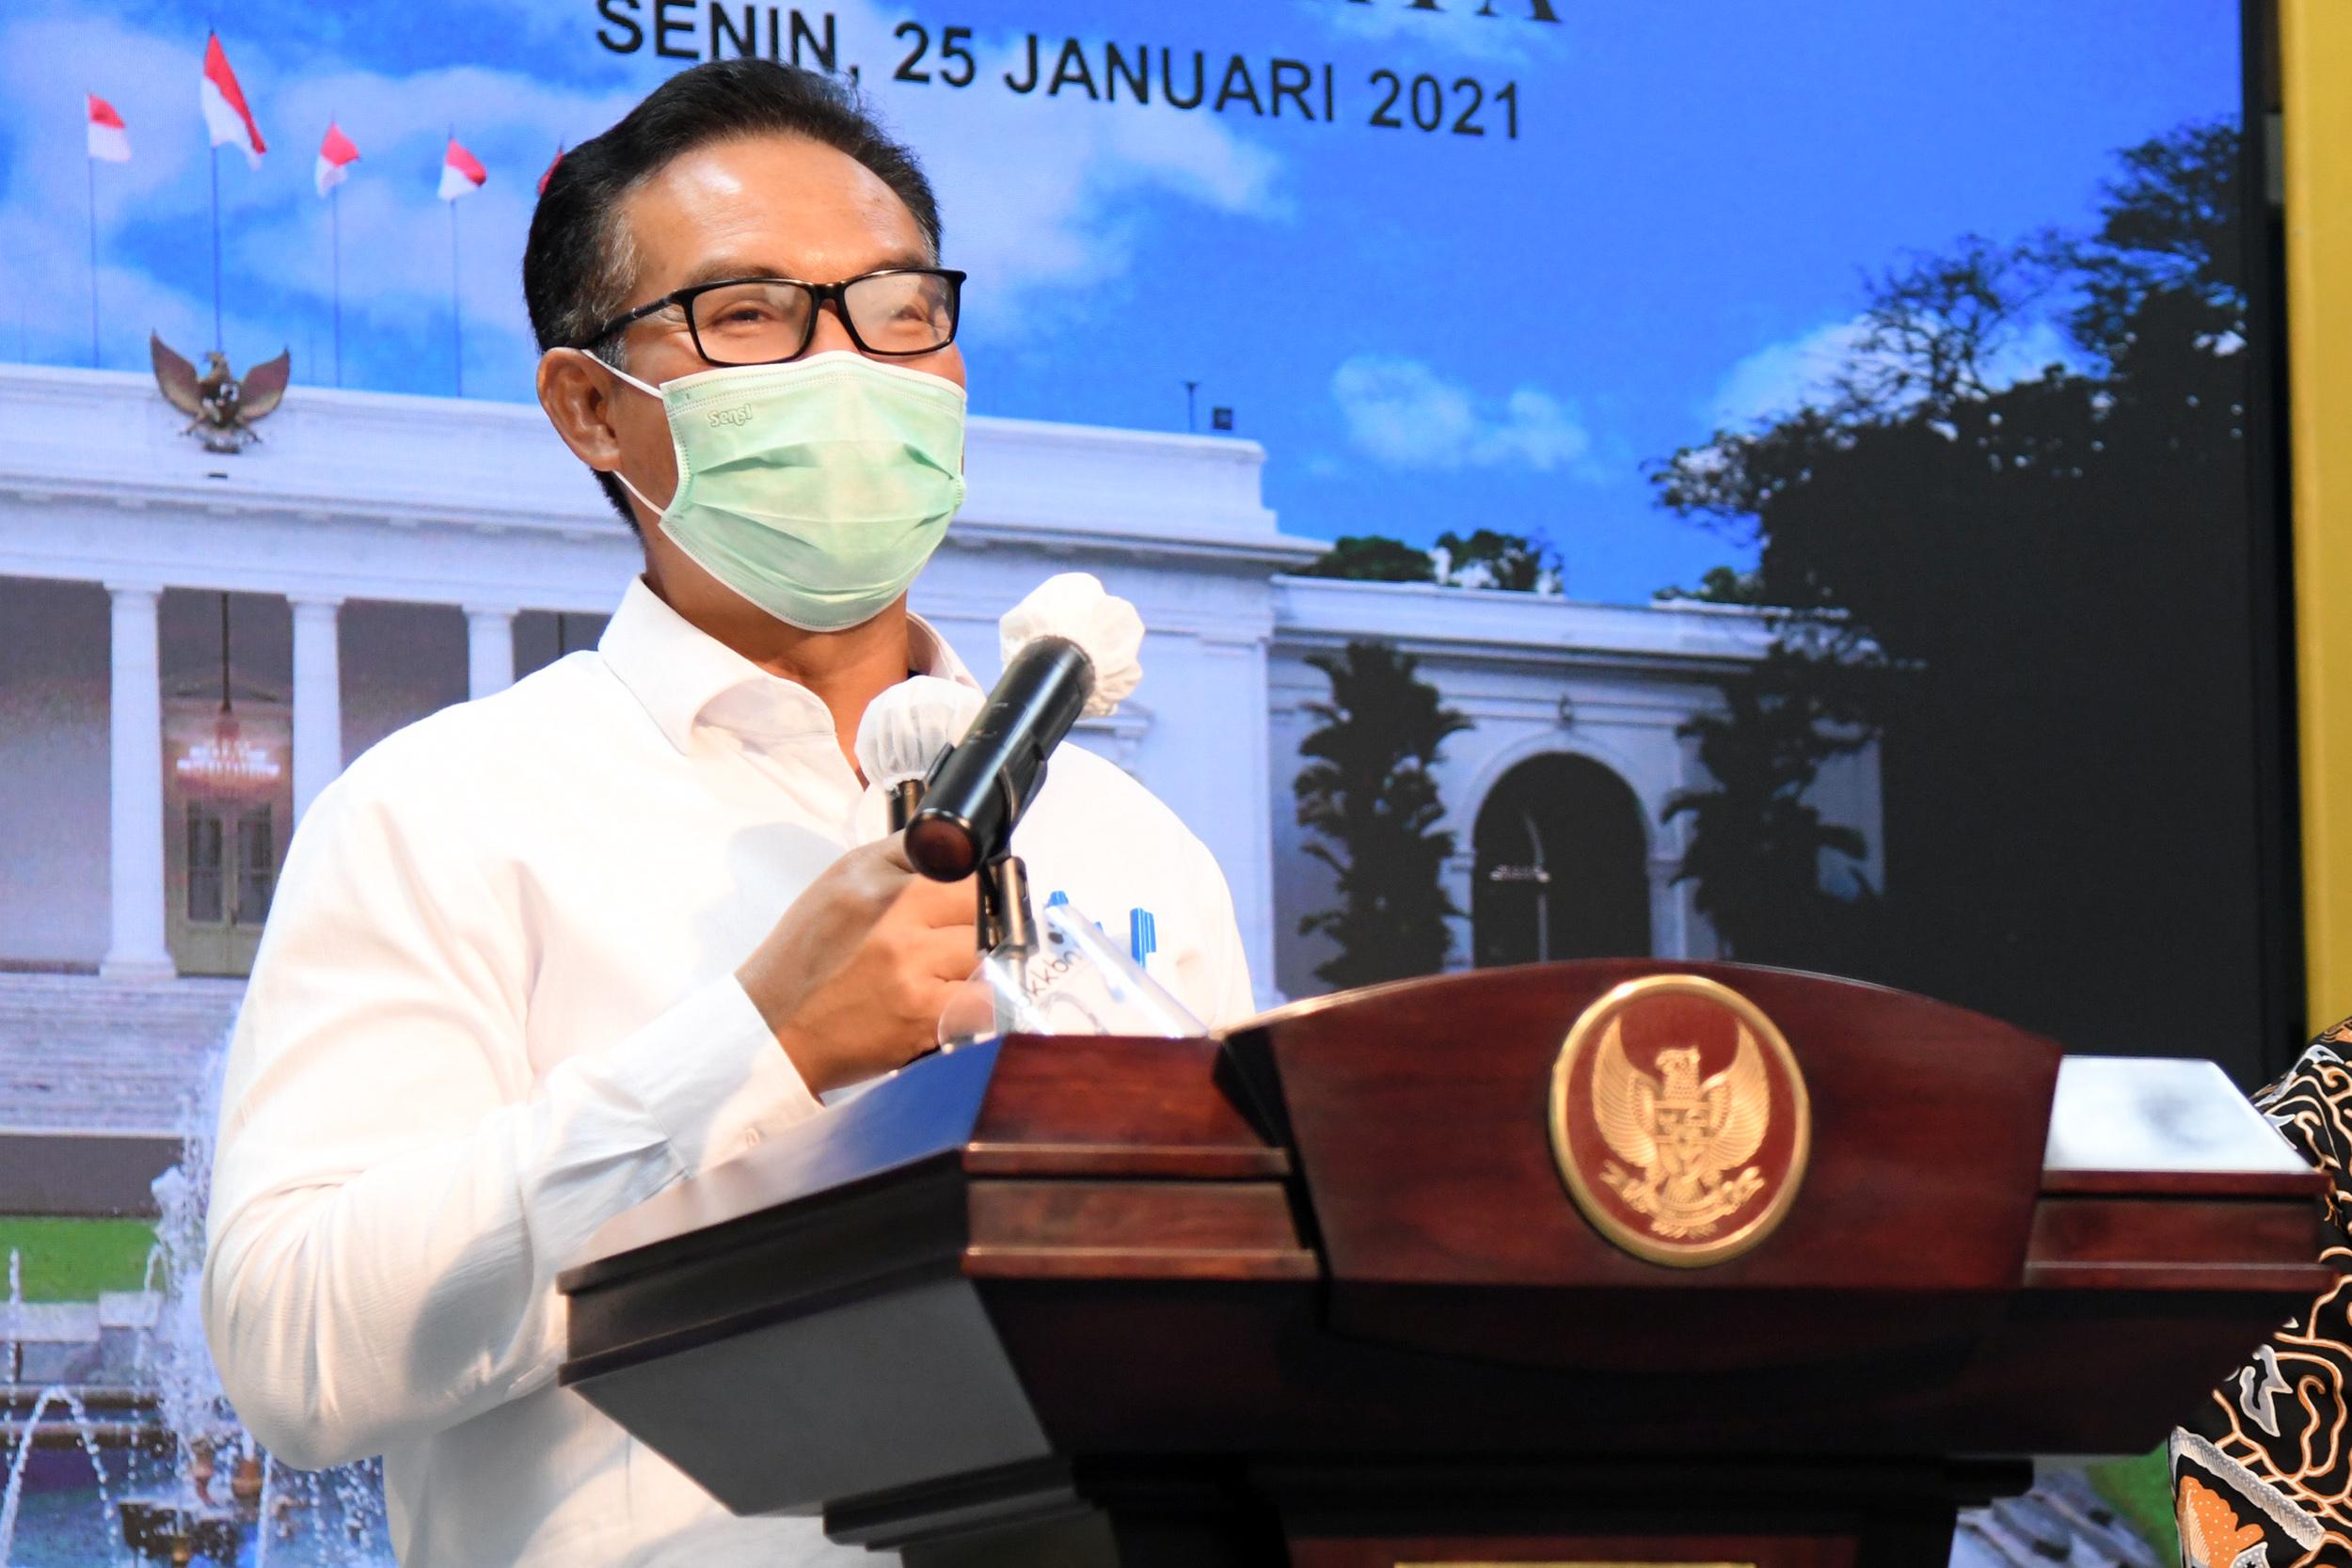 Presiden Minta BKKBN Tingkatkan Kualitas Manajemen Program Penurunan Stunting